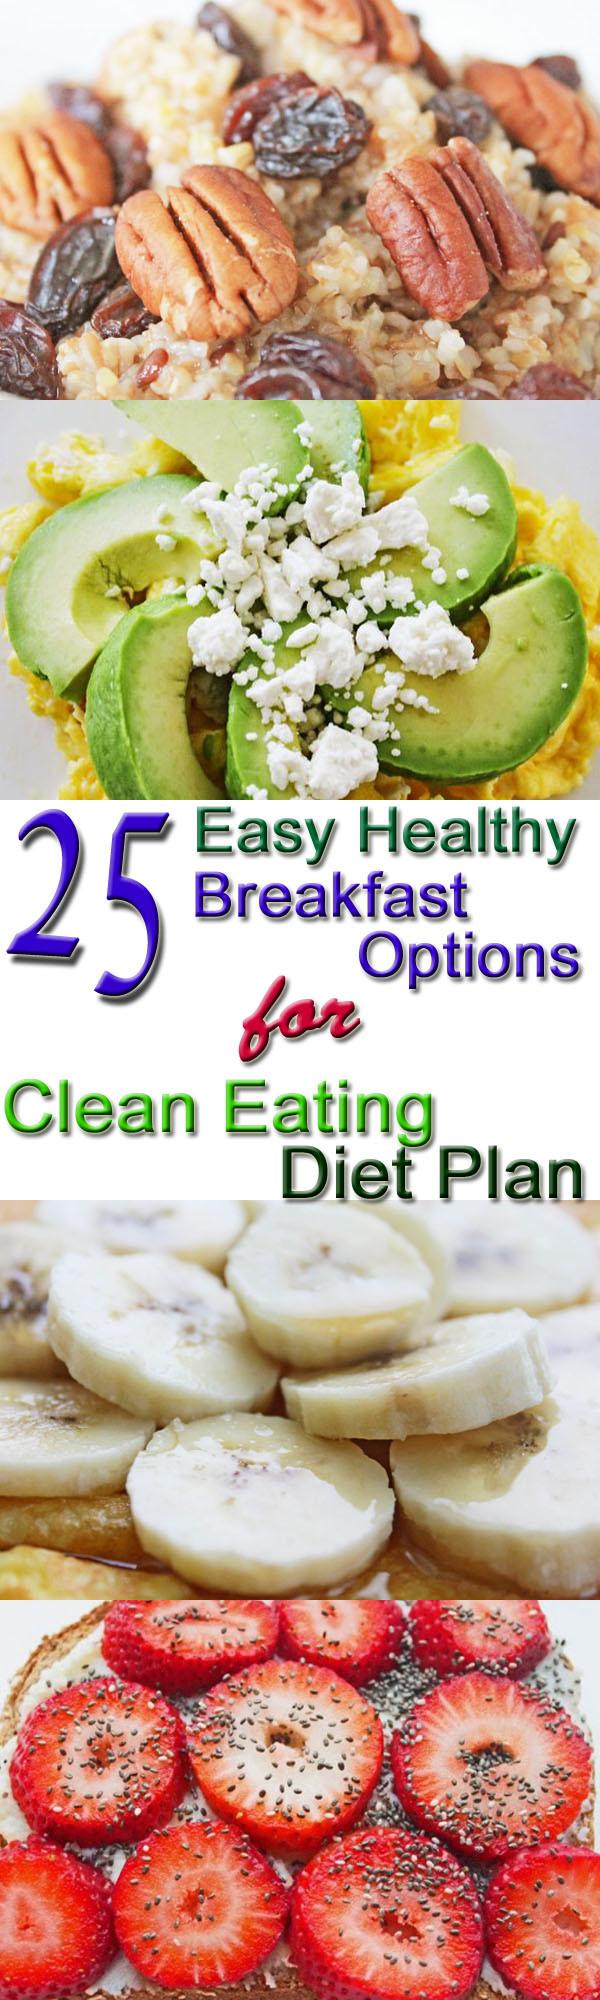 Easy Healthy Breakfast Meals  25 Healthy Breakfast Options